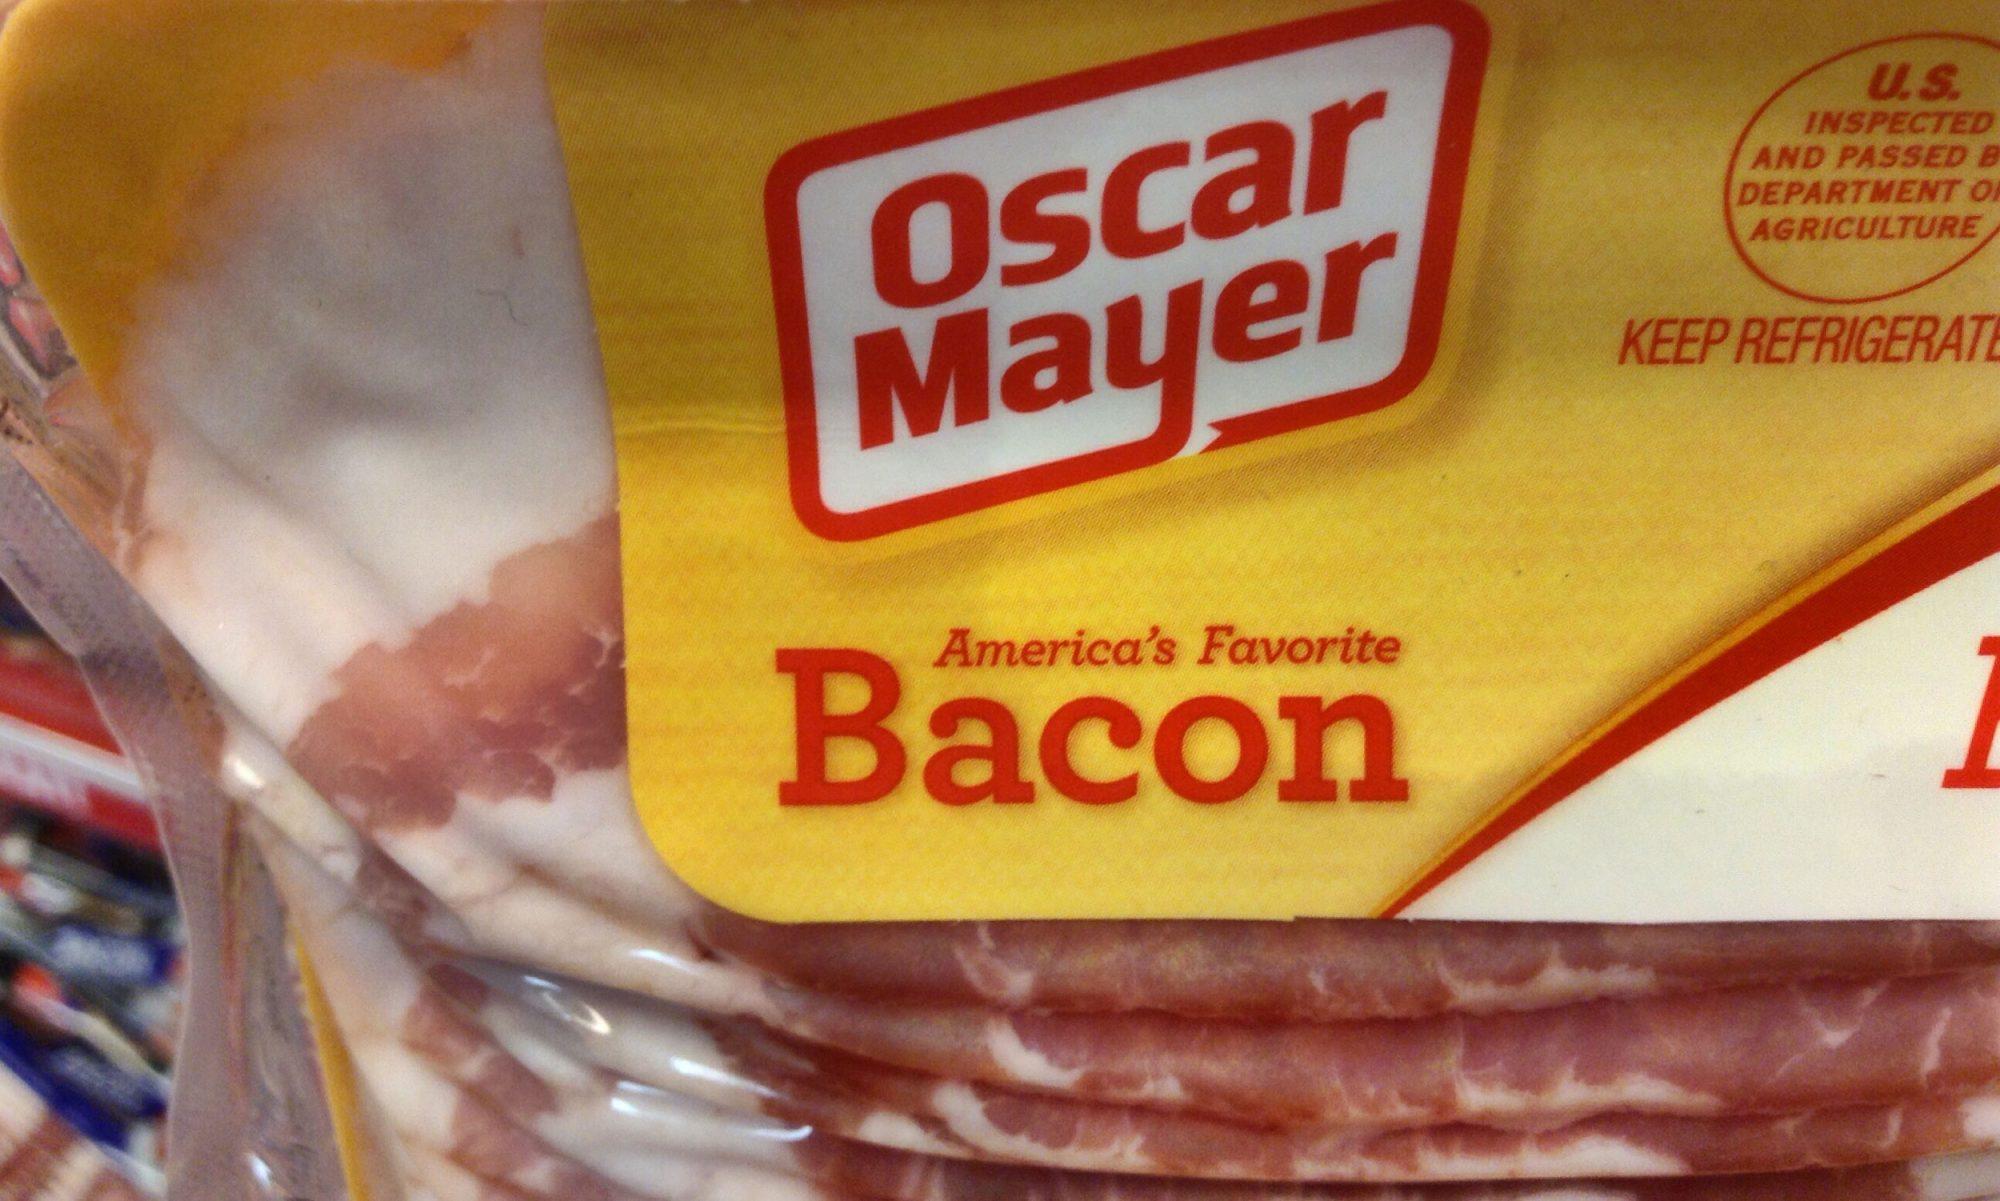 EC: Oscar Mayer Just Launched a Bacon Font